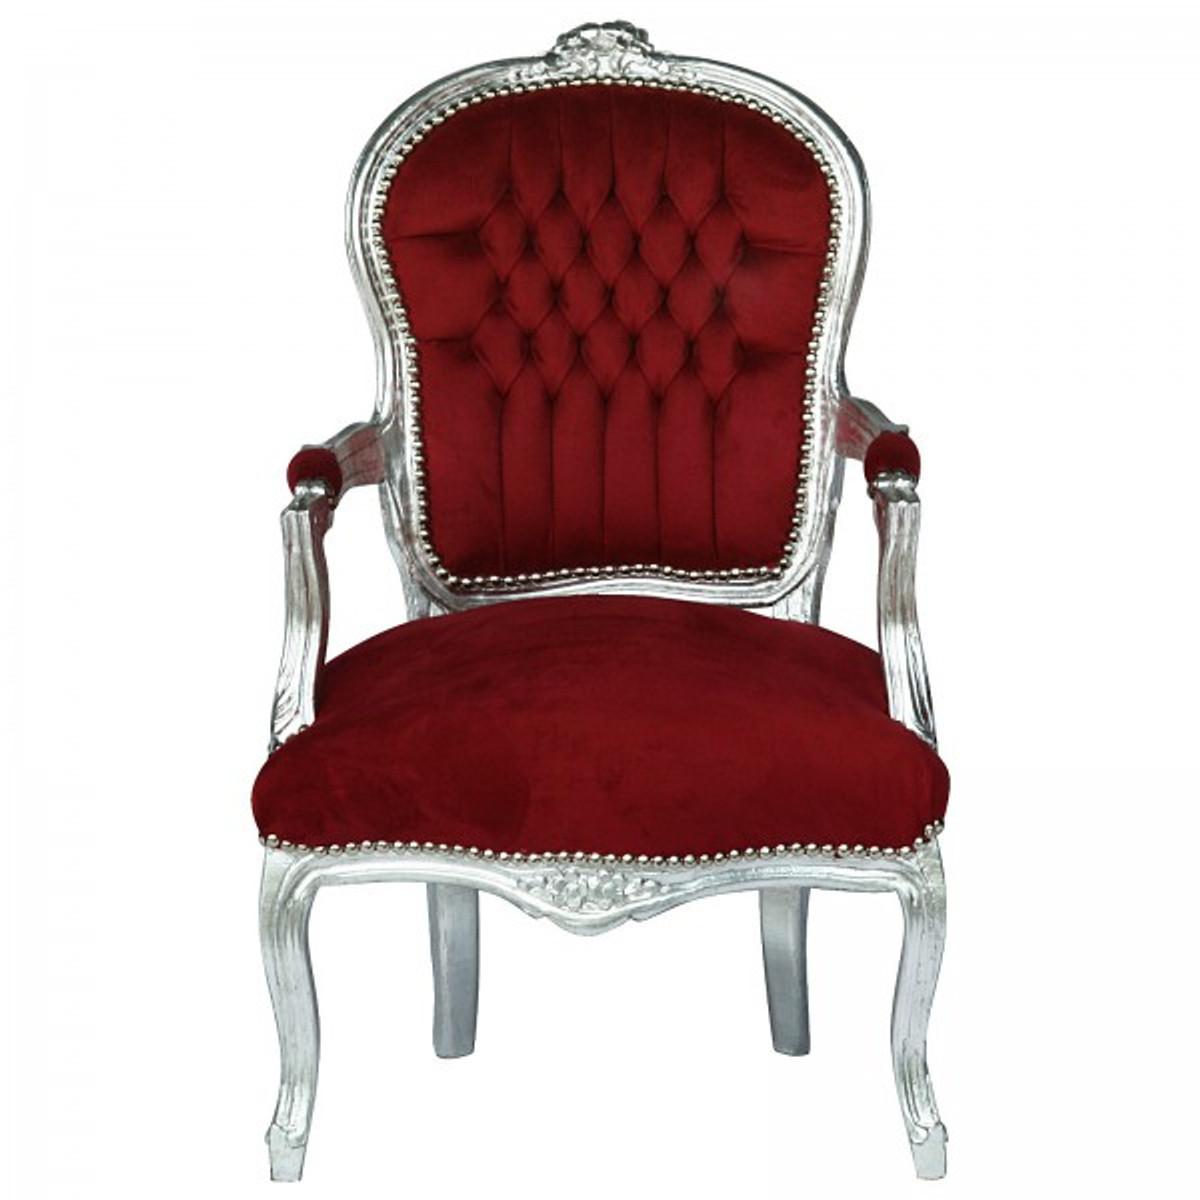 Stuhl Lounge Rokoko Barock Konferenzstuhl Silber Rot nP0k8wO